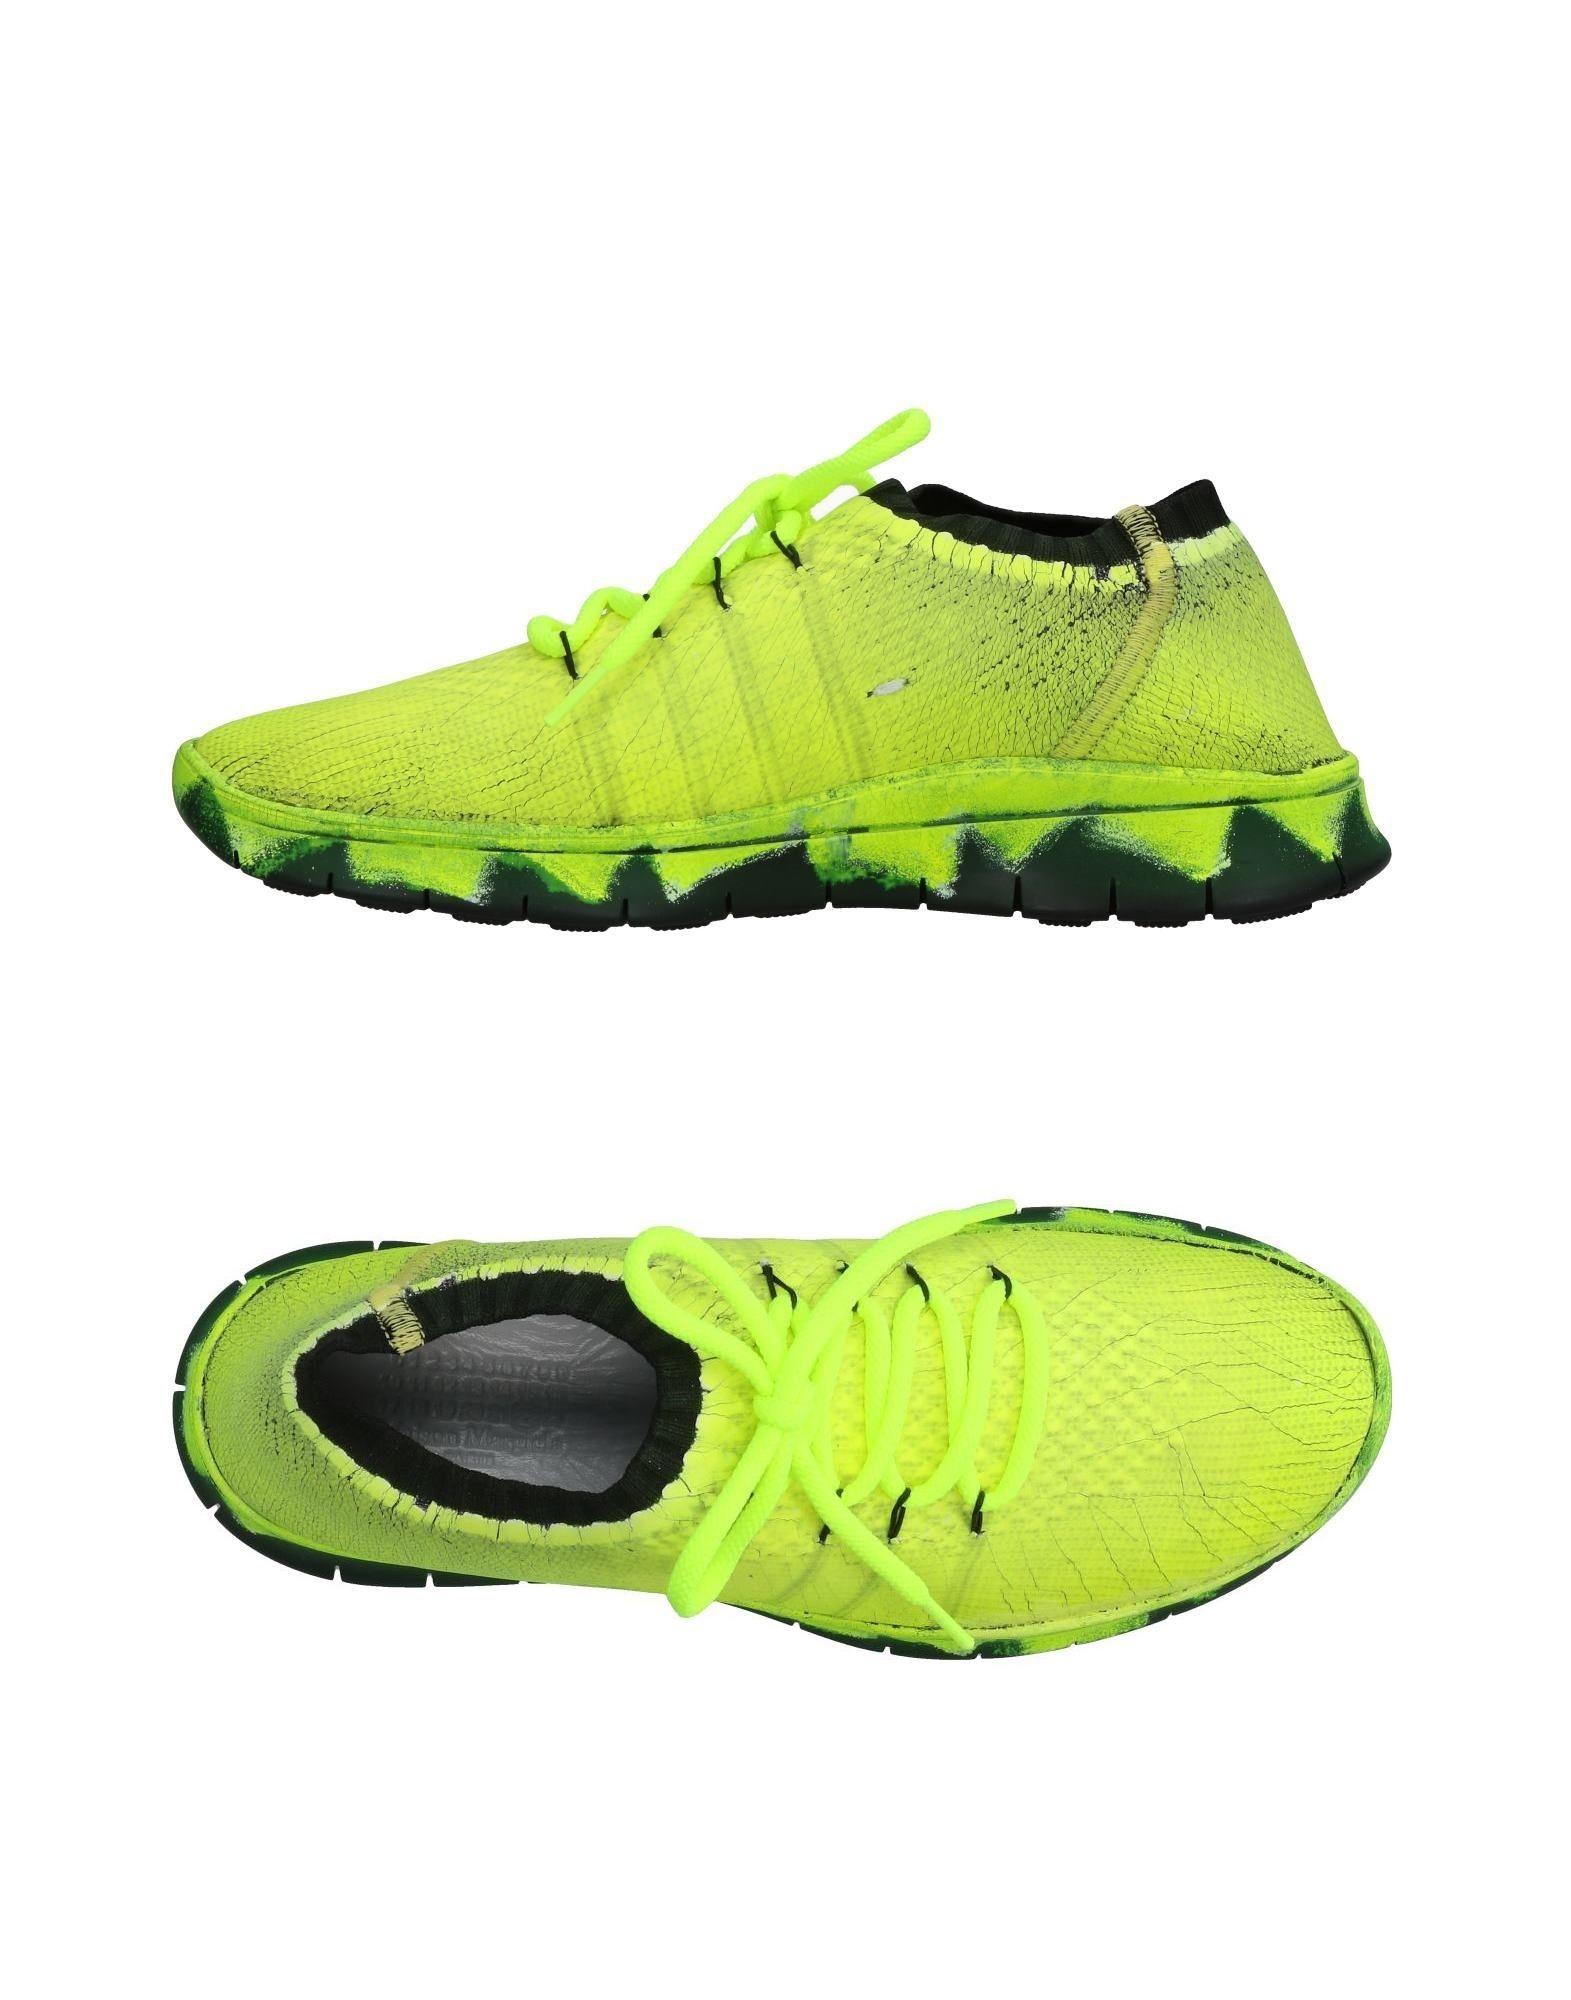 Maison on Margiela Sneakers - Men Maison Margiela Sneakers online on Maison  Australia - 11341542ON 758aa5